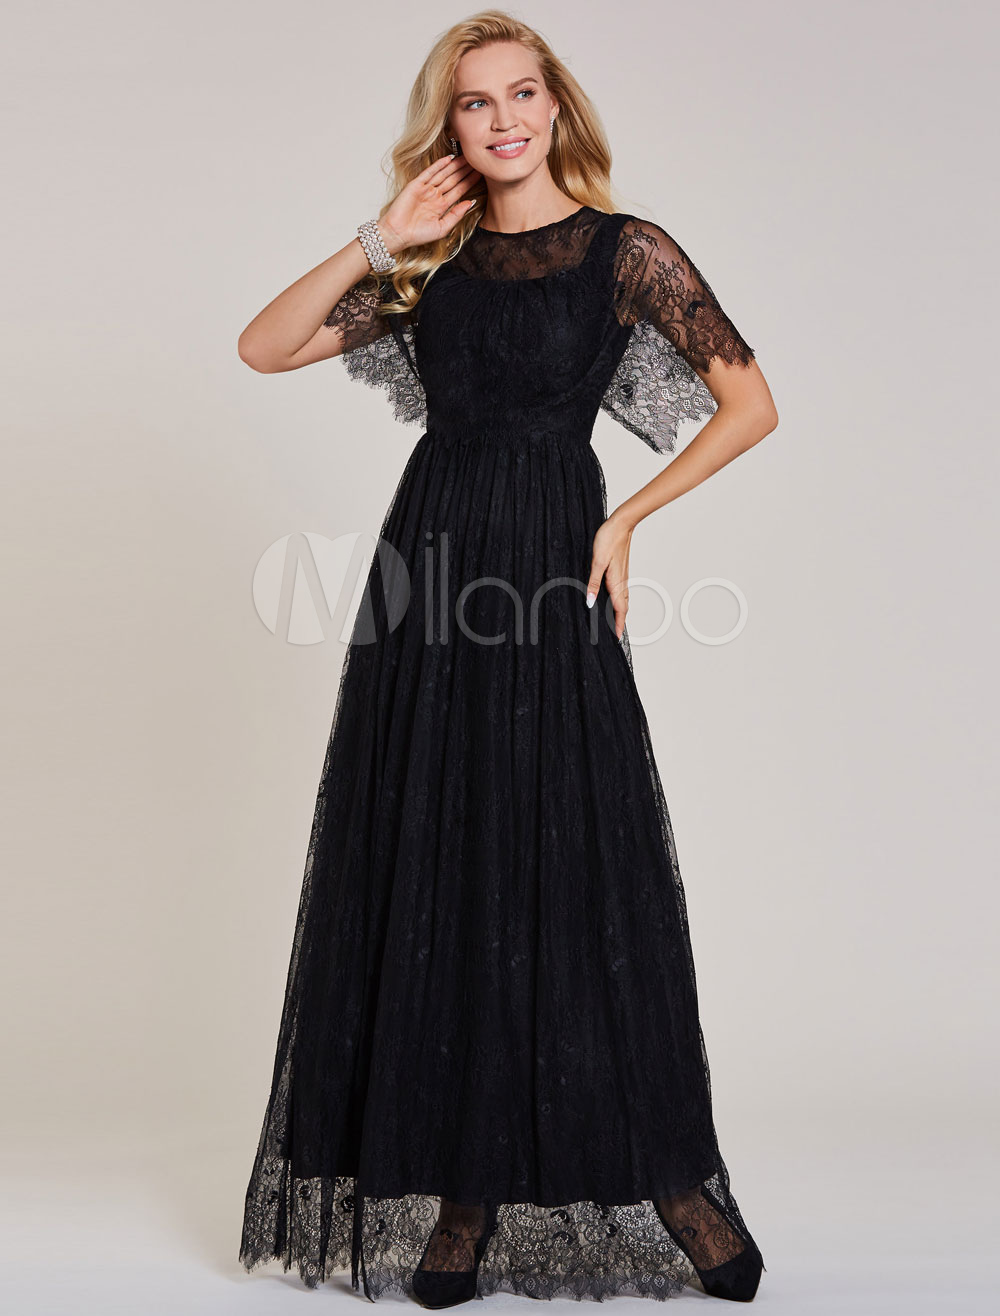 Lace Evening Dresses Black Short Sleeve Prom Dress Long Floor Length Formal Poncho Cape Dress (Wedding Cheap Party Dress) photo